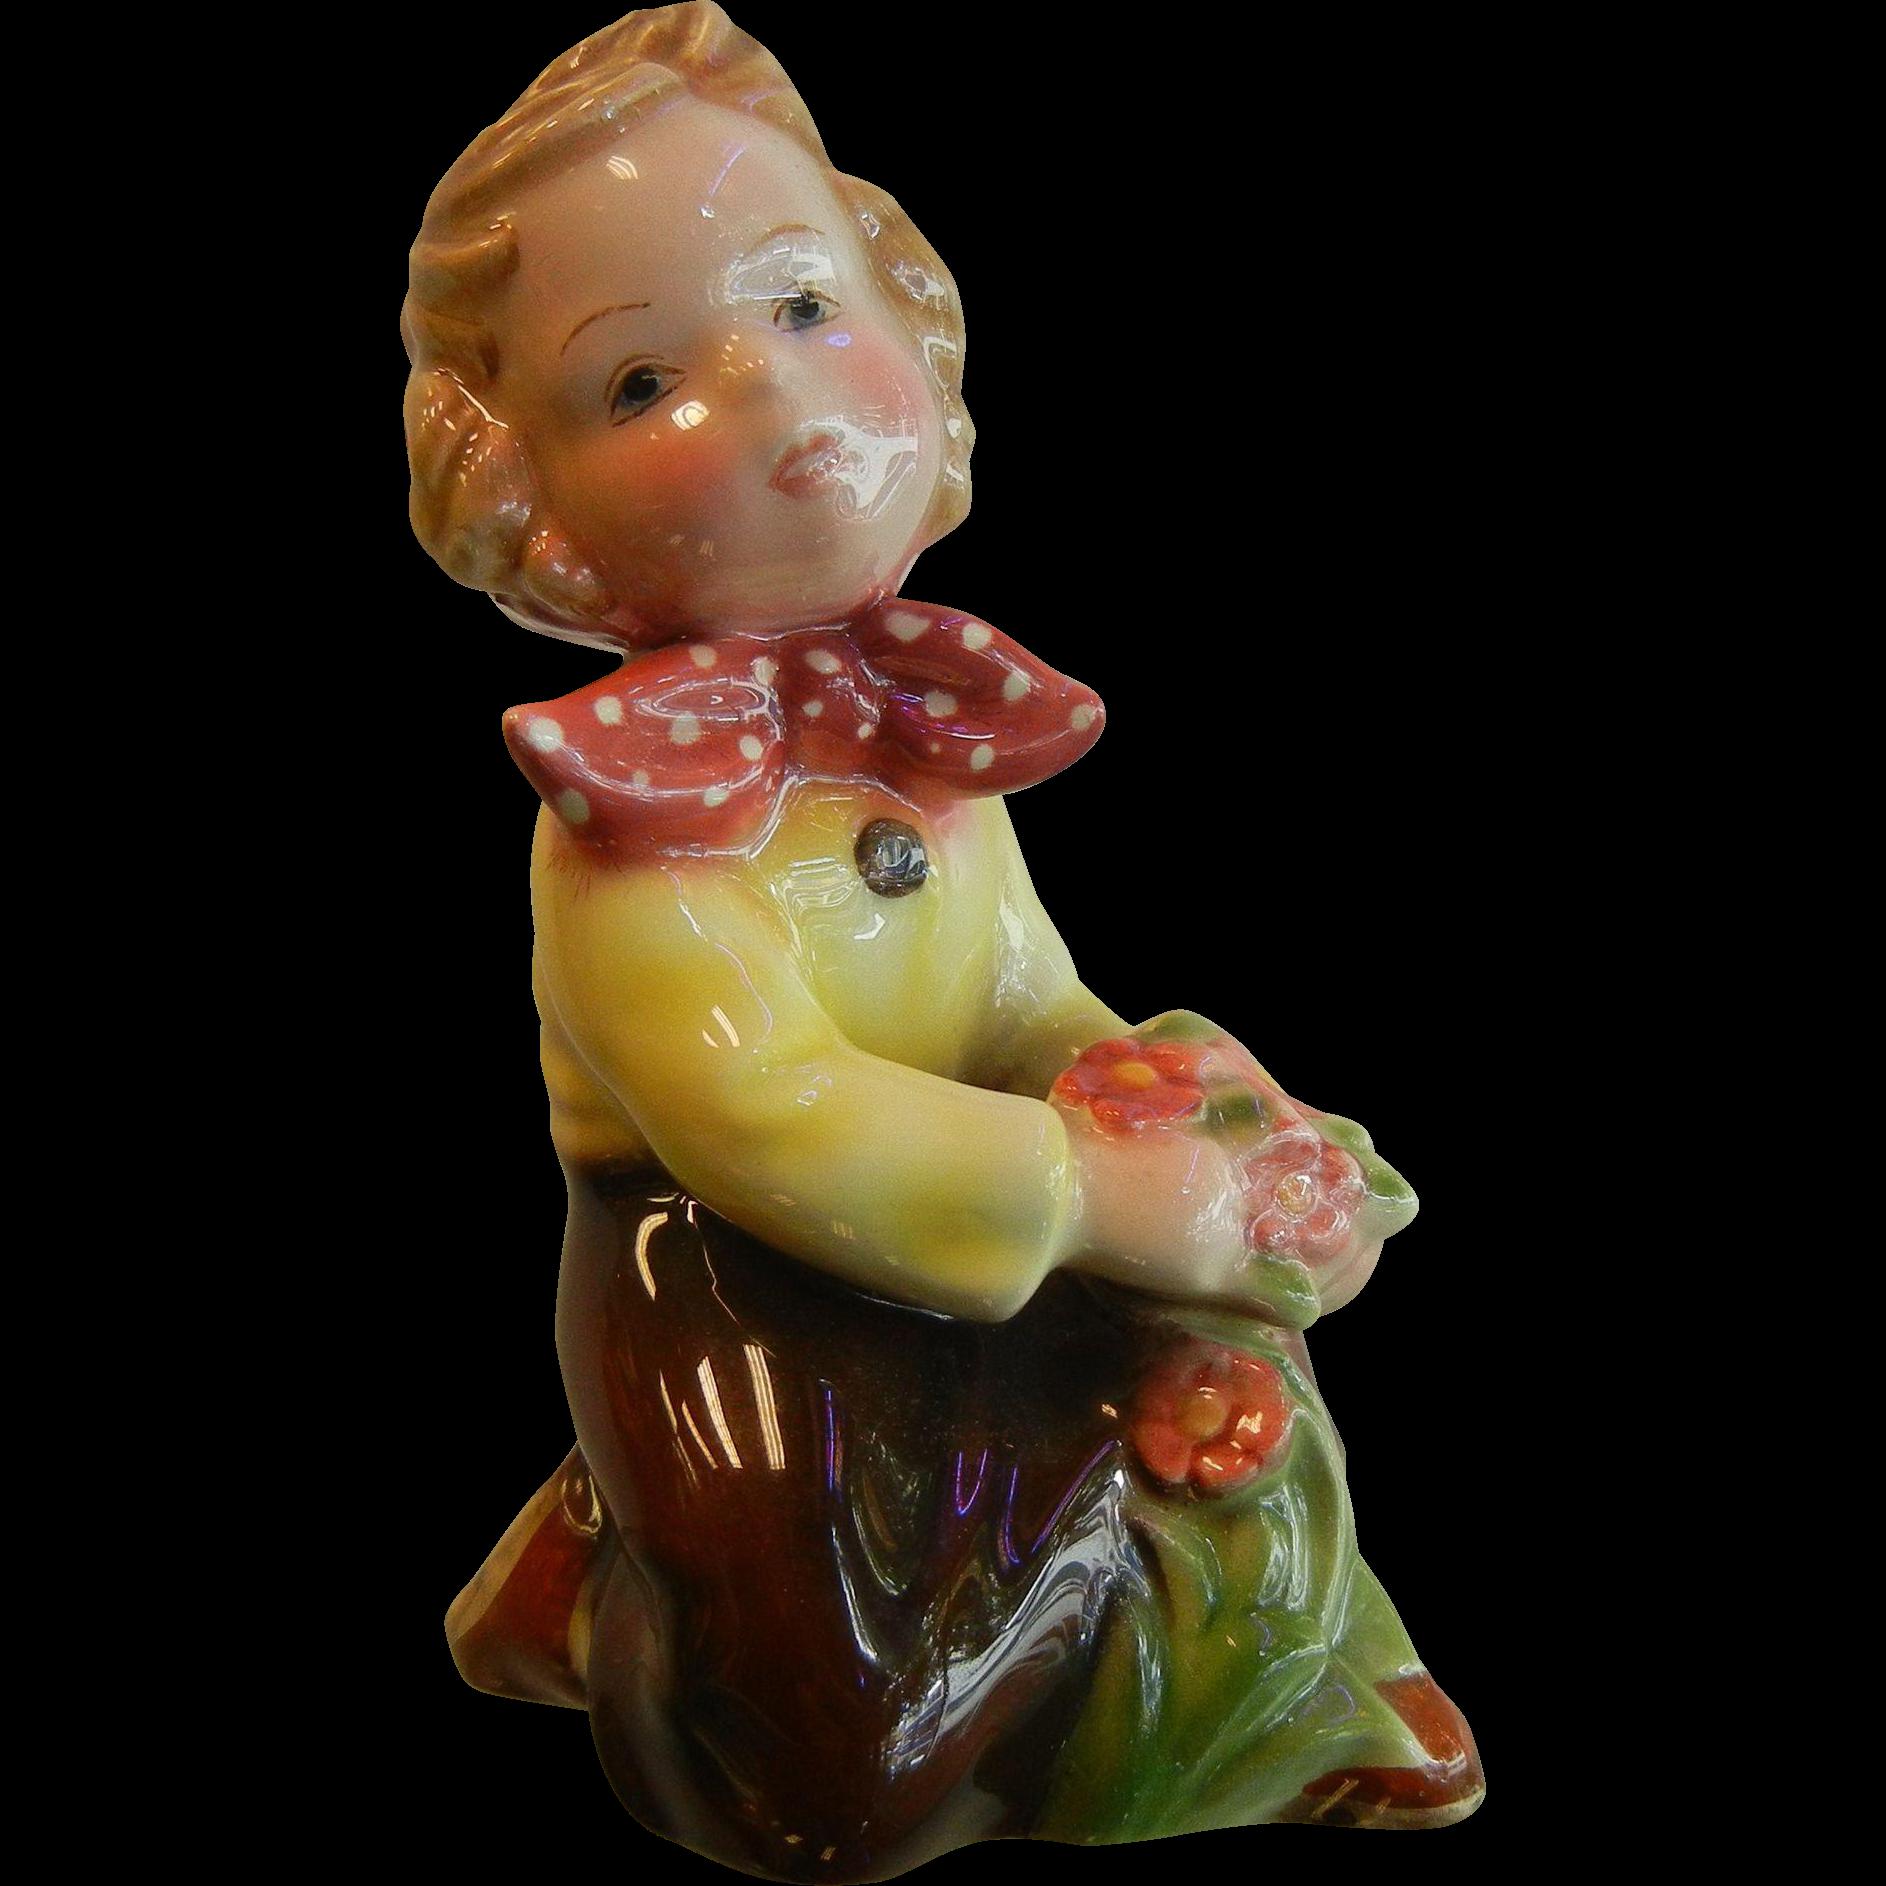 Vintage Royal Belvedere Vienna Austrian Porcelain Figurine of Little Girl & Flowers